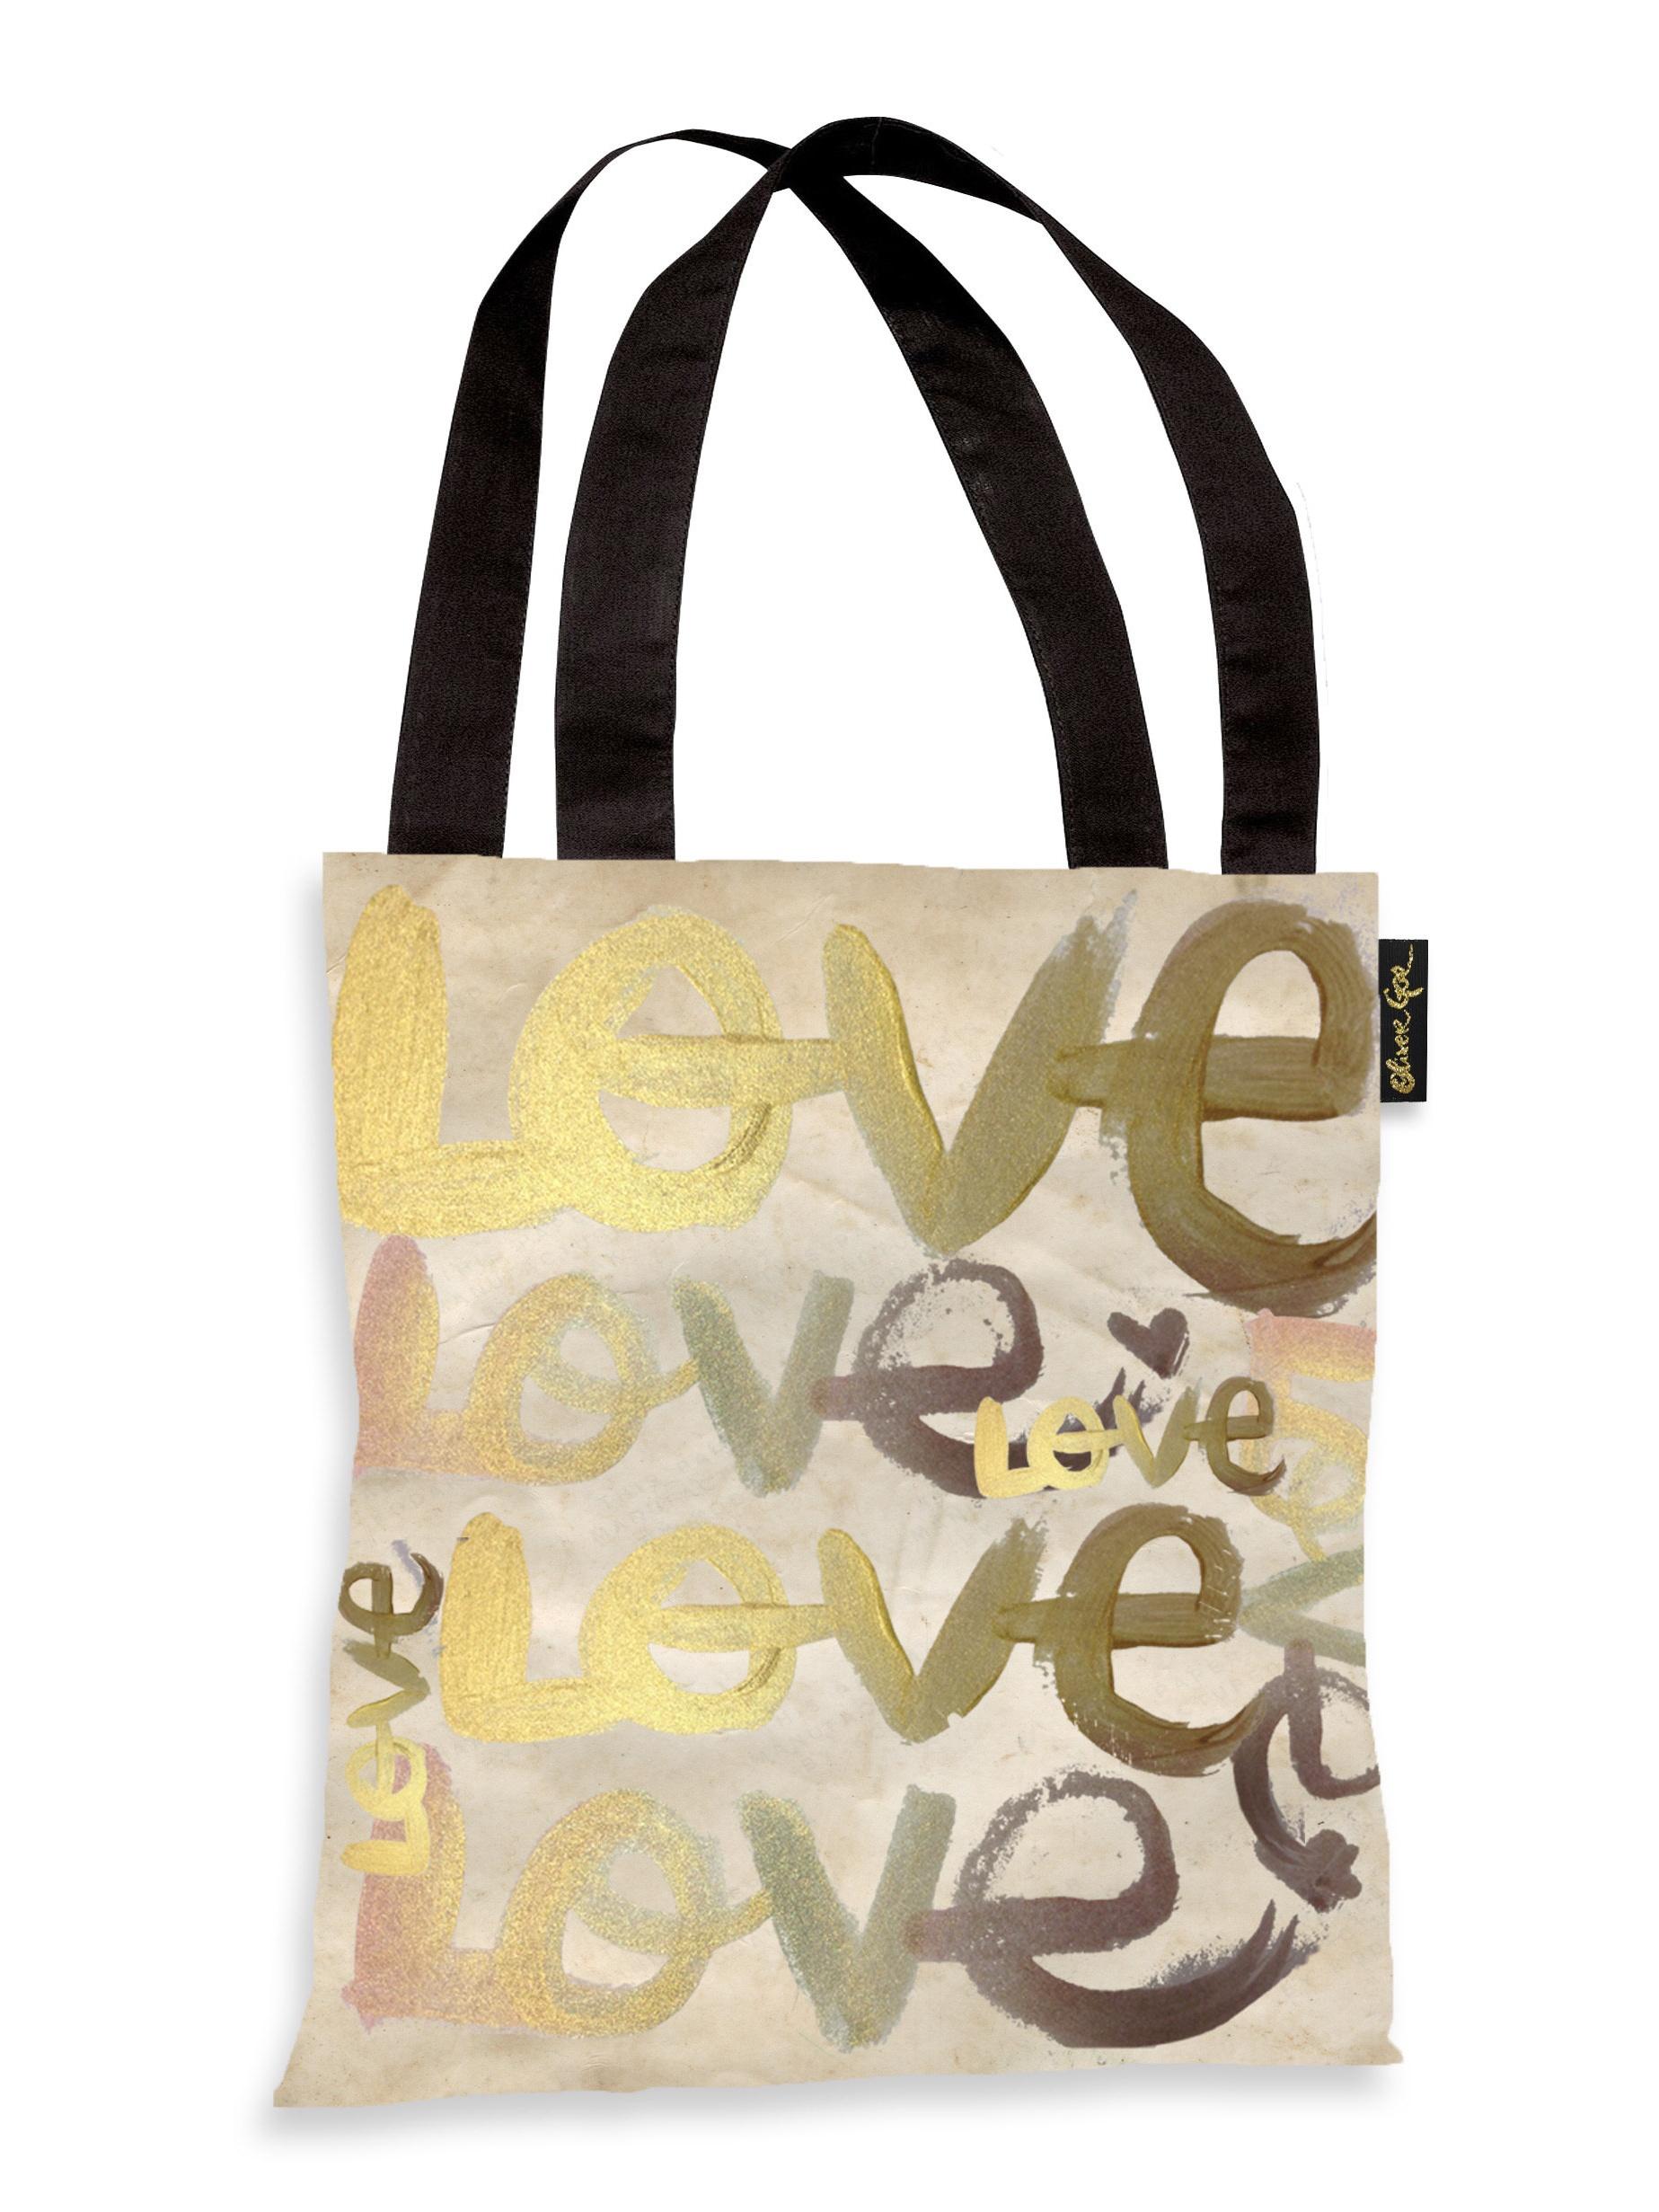 Oliver Gal Artist Co.  'Four Letter Word' Tote Bag